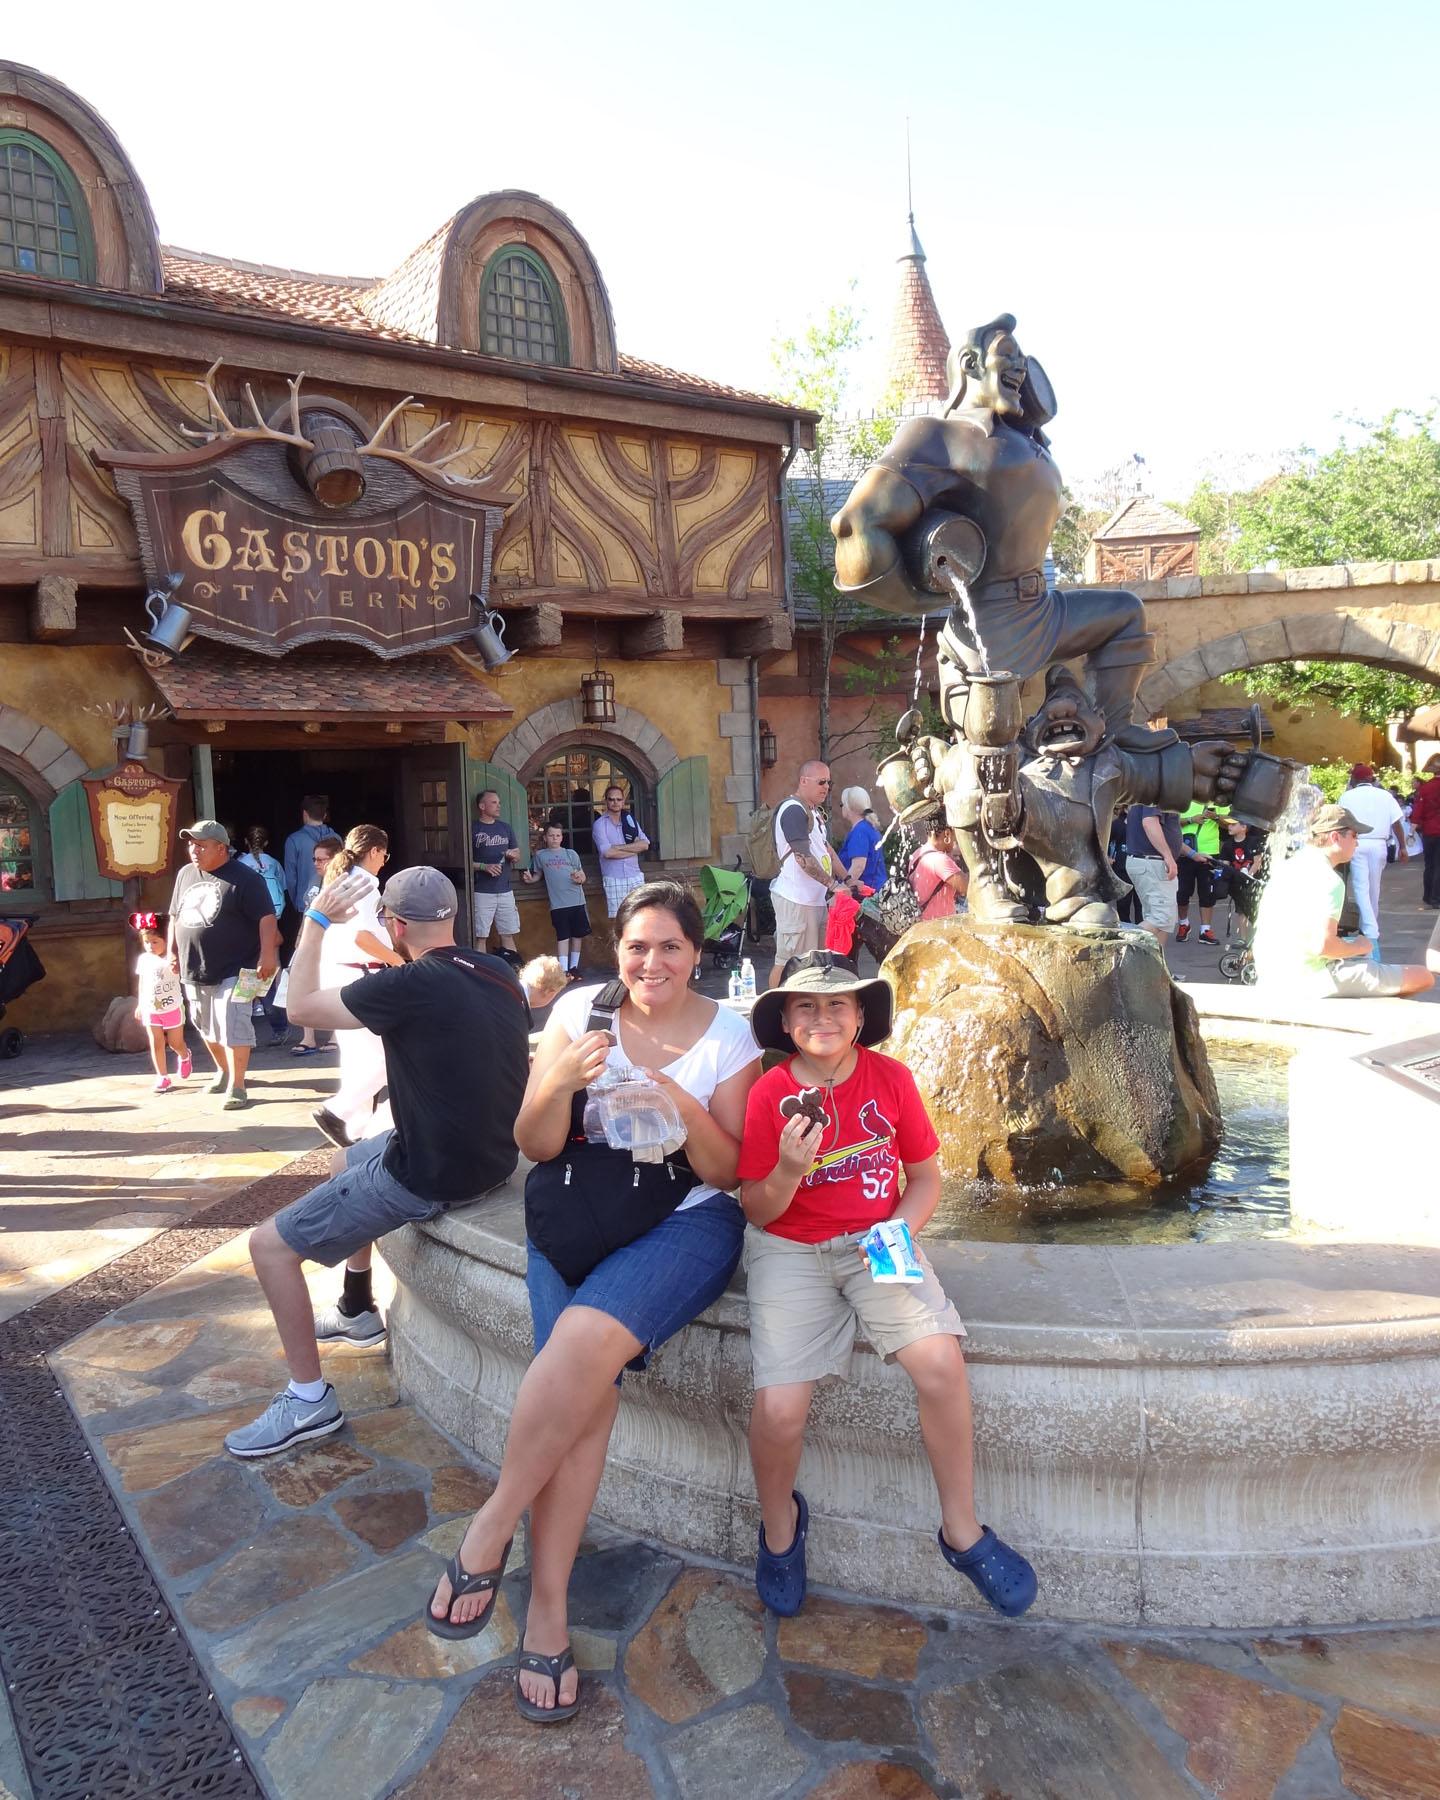 Magic Kingdom, Disney World, Florida USA, 2016